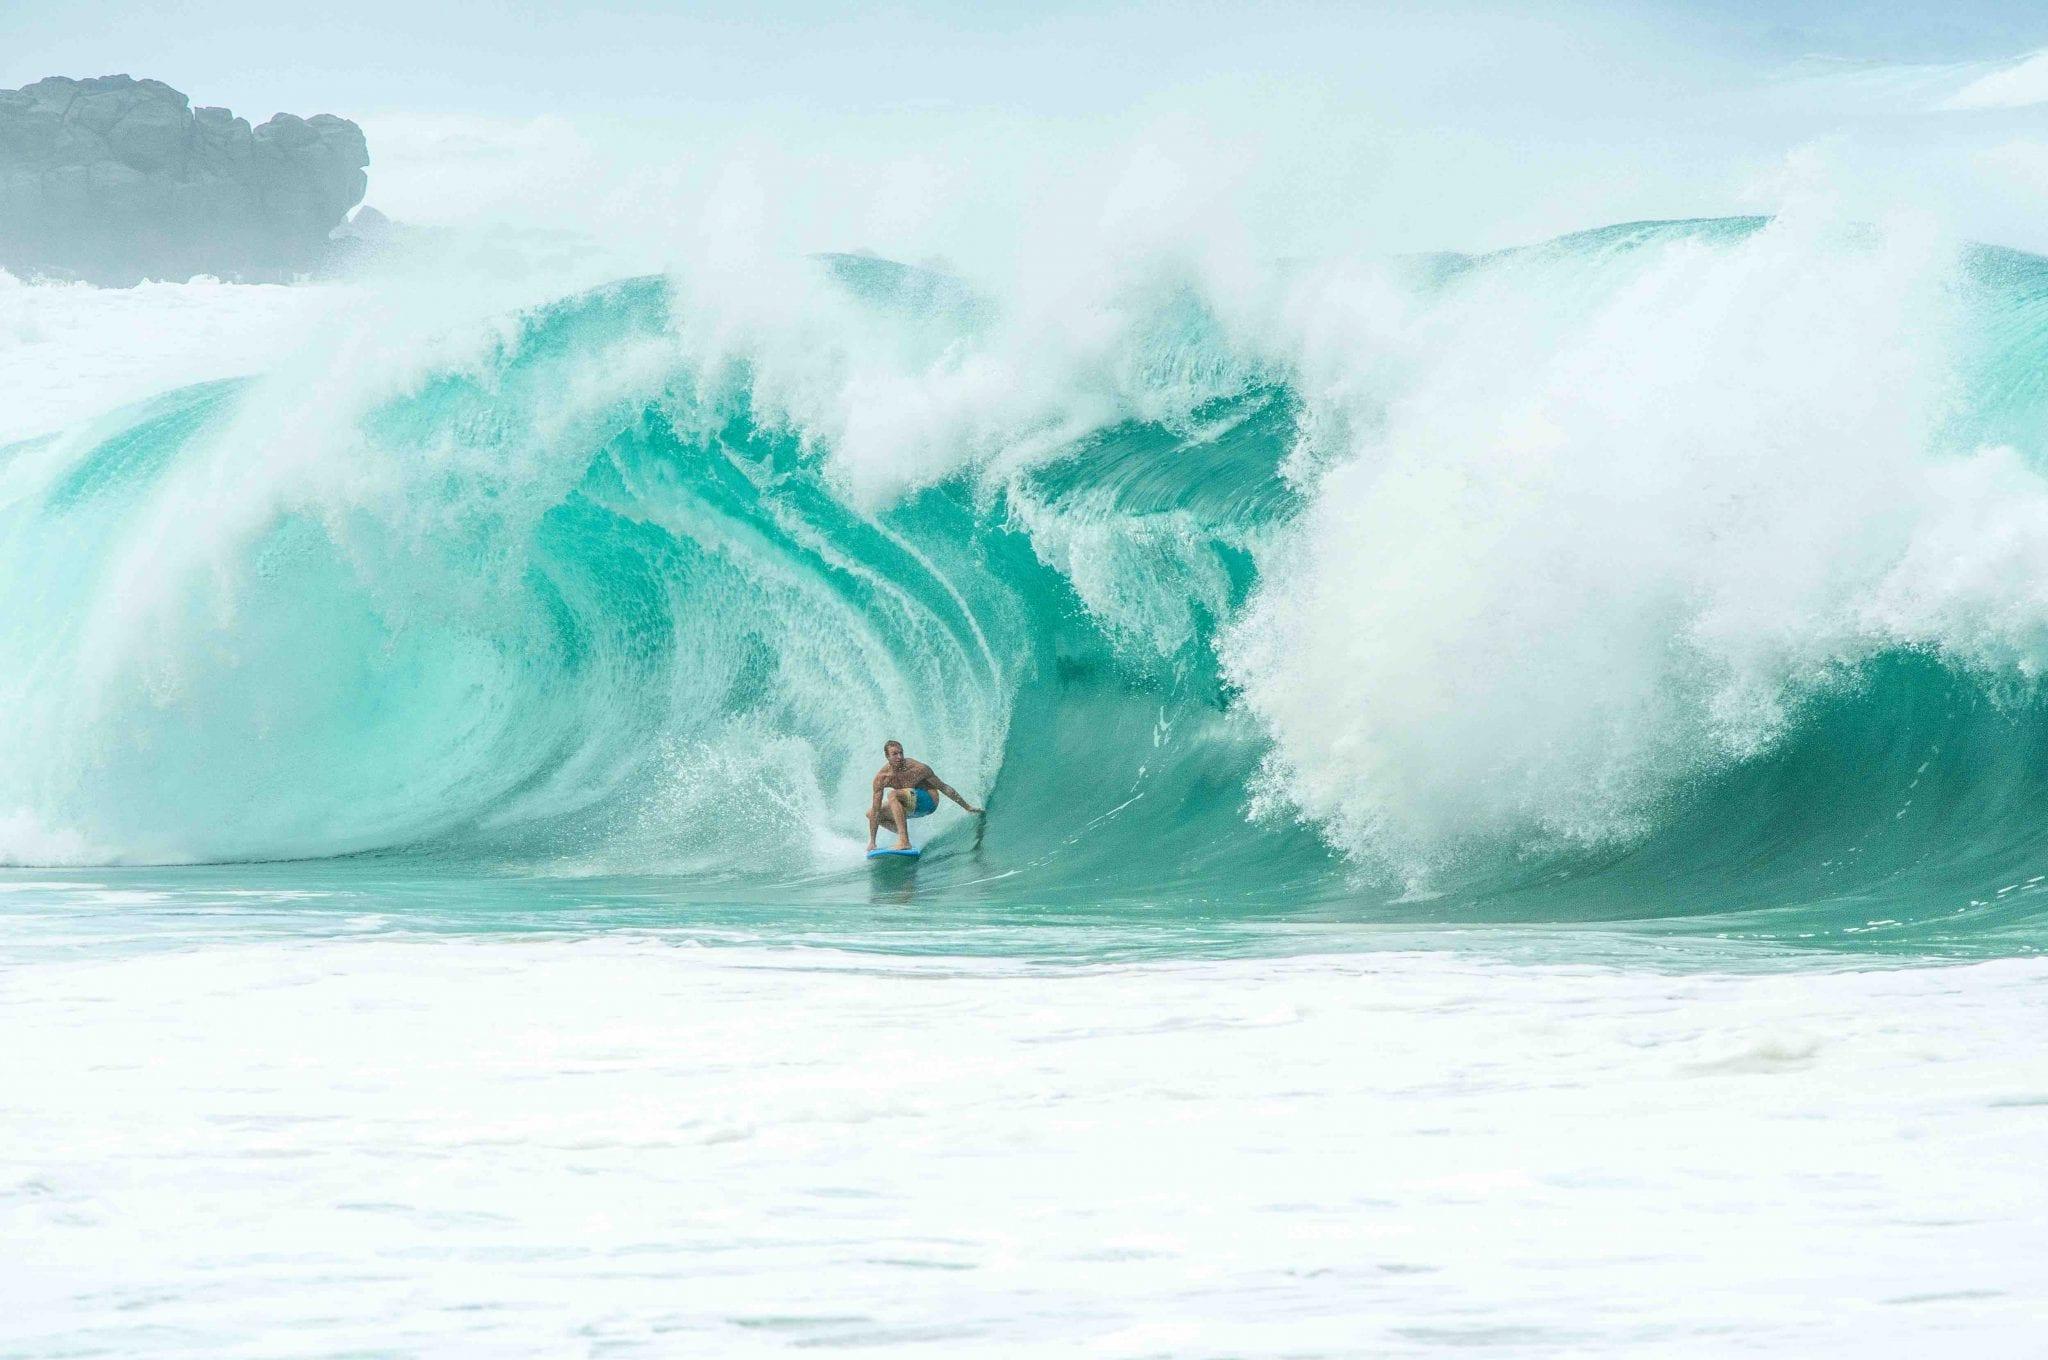 Surfübung vor dem Surfurlaub